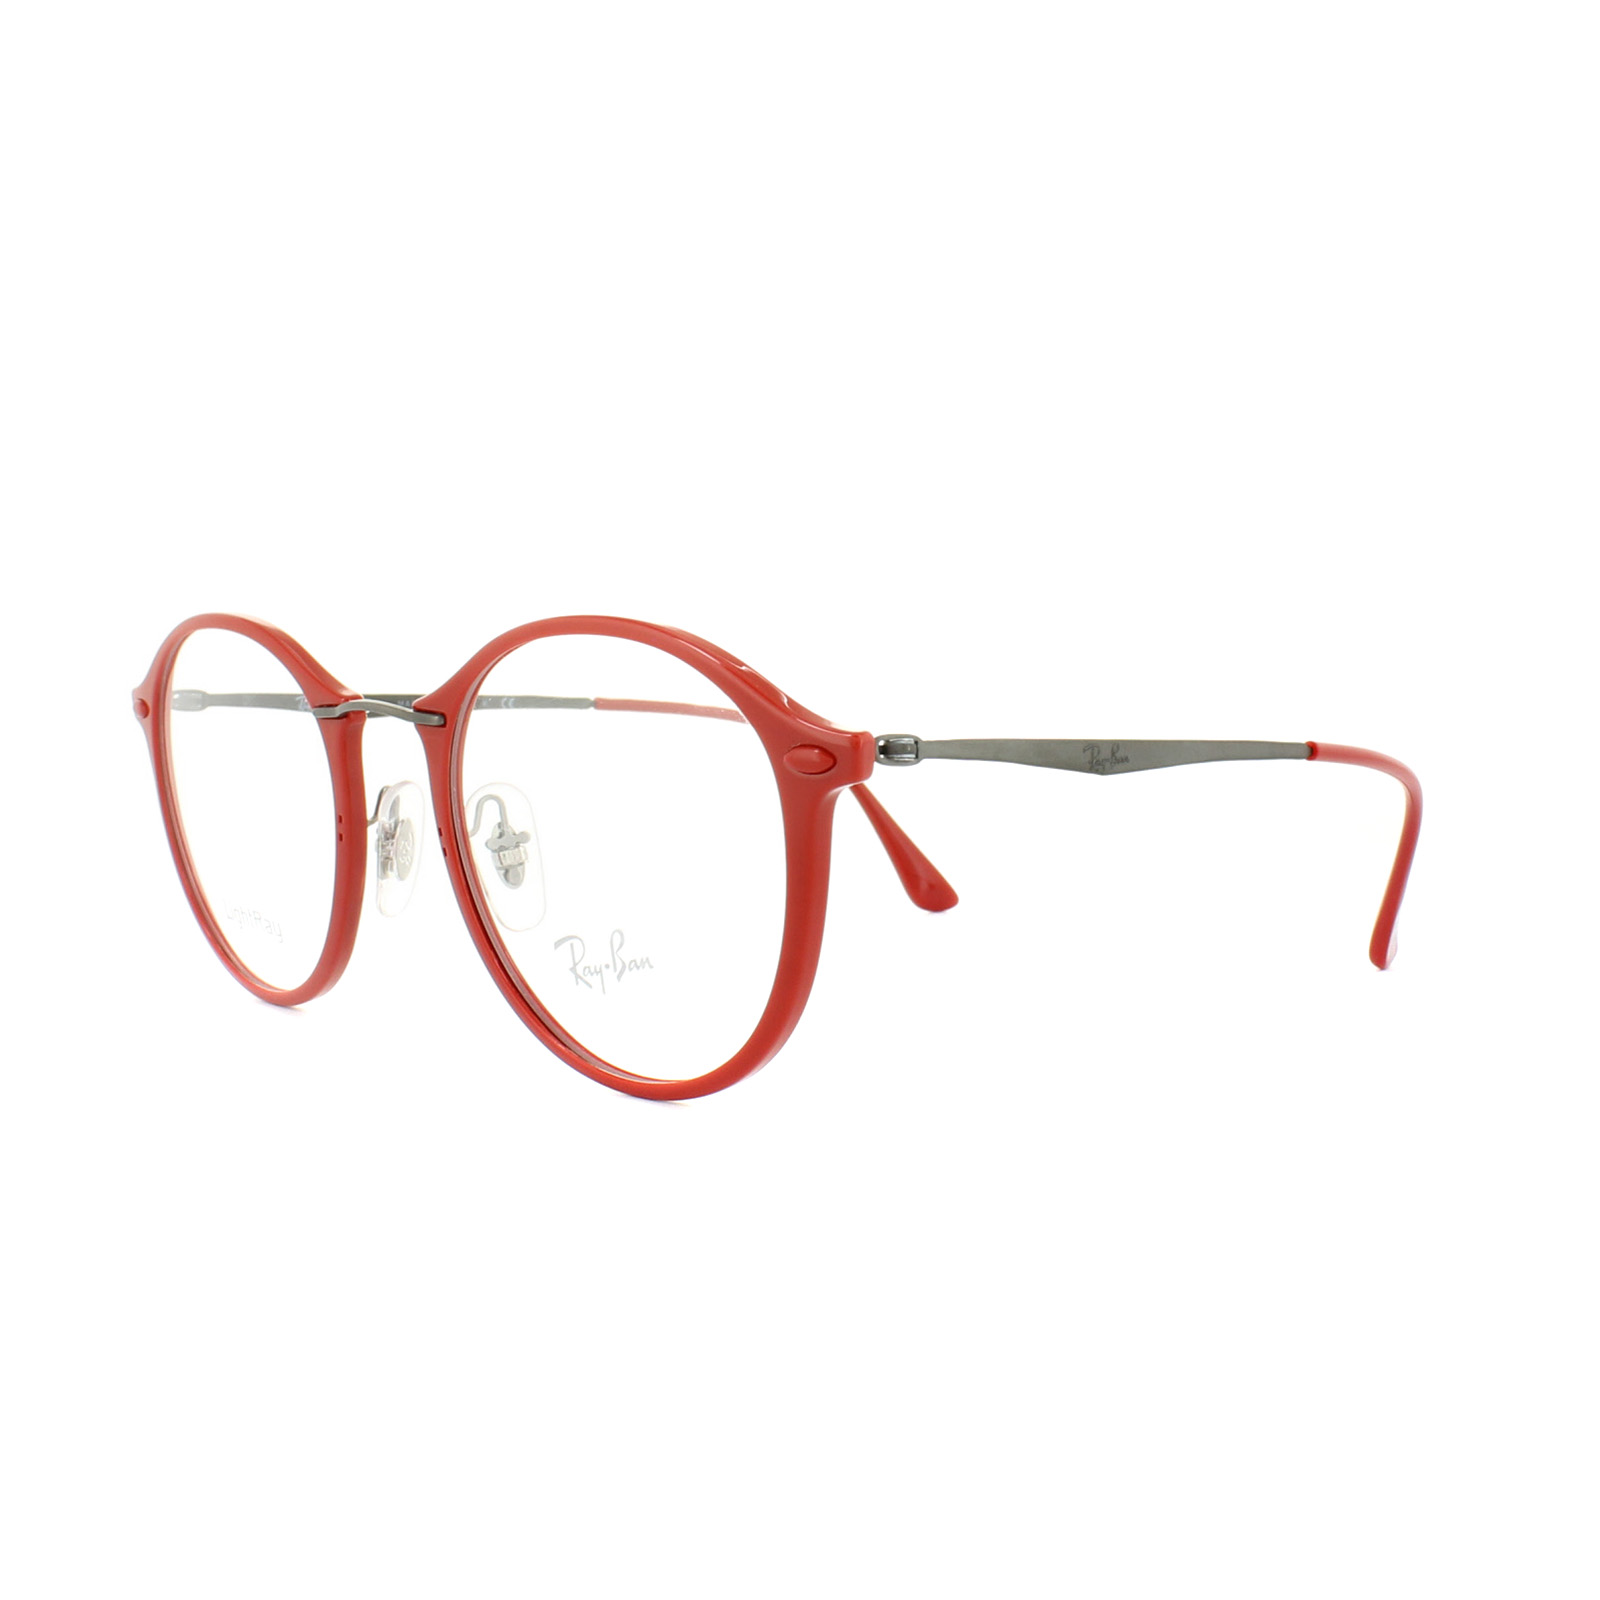 7c72fb28a5db17 Sentinel Ray-Ban Glasses Frames RX 7073 5619 Shiny Red Mens Womens 49mm